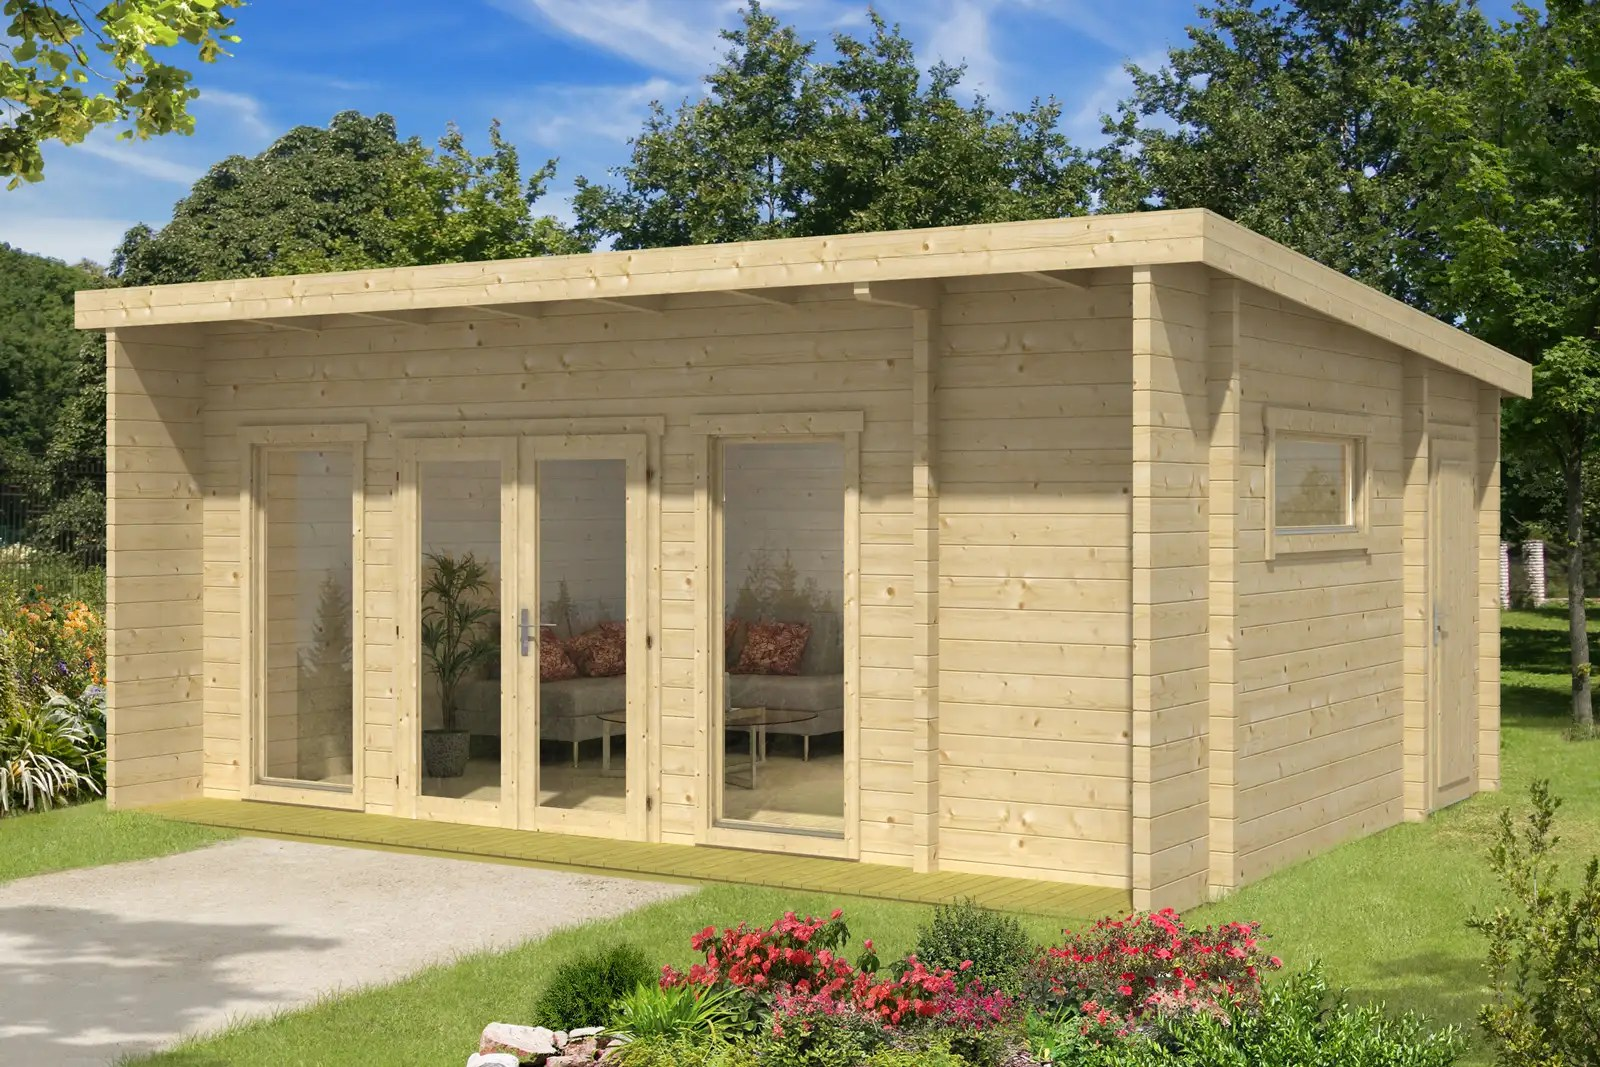 Gartenhaus Modell Carla 70 Iso Gartenhaus Modell Carla 70